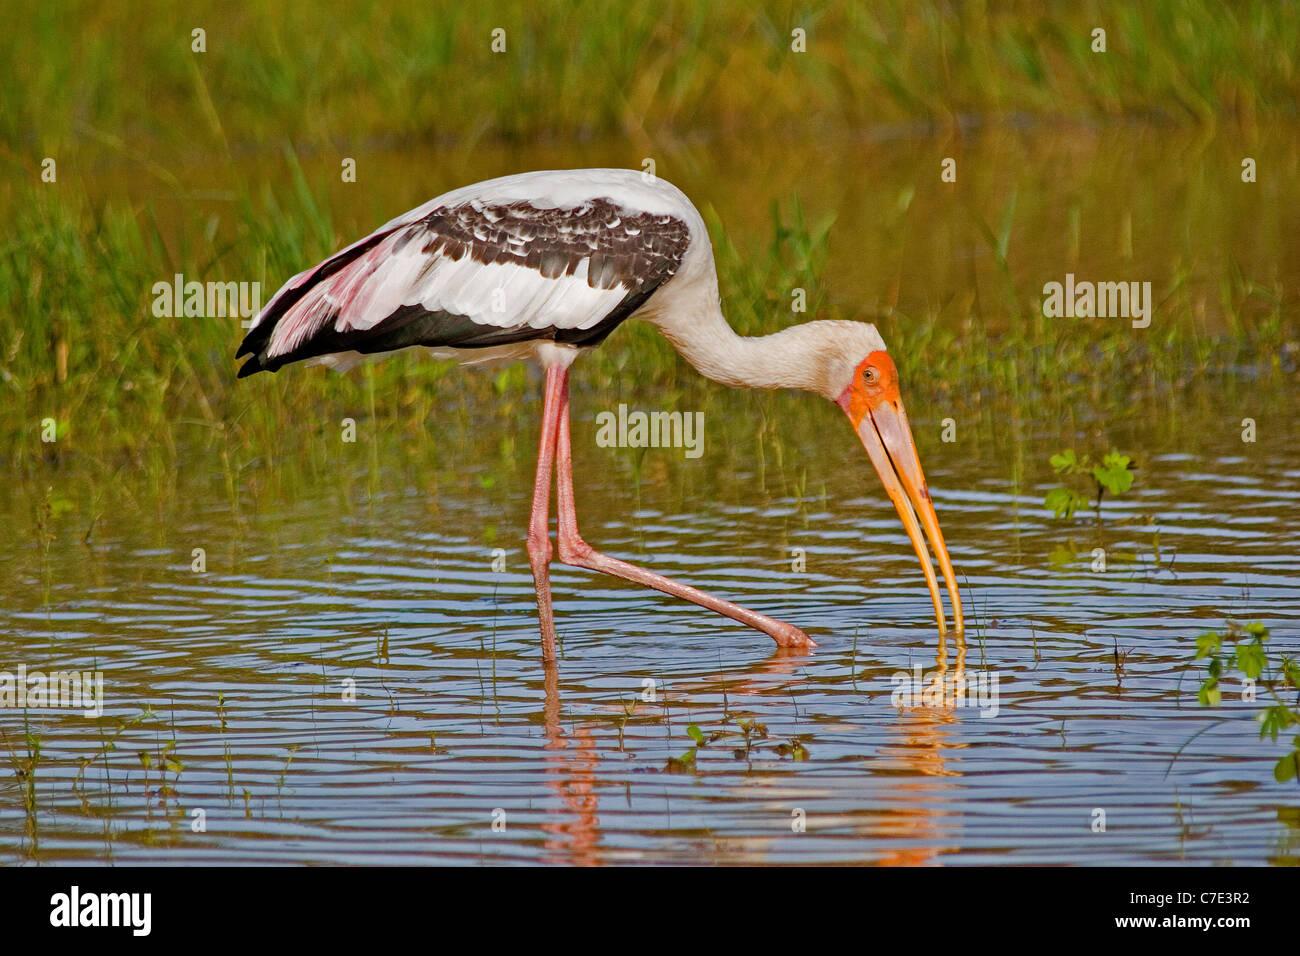 Painted stork mycteria leucocephala Sri Lanka - Stock Image